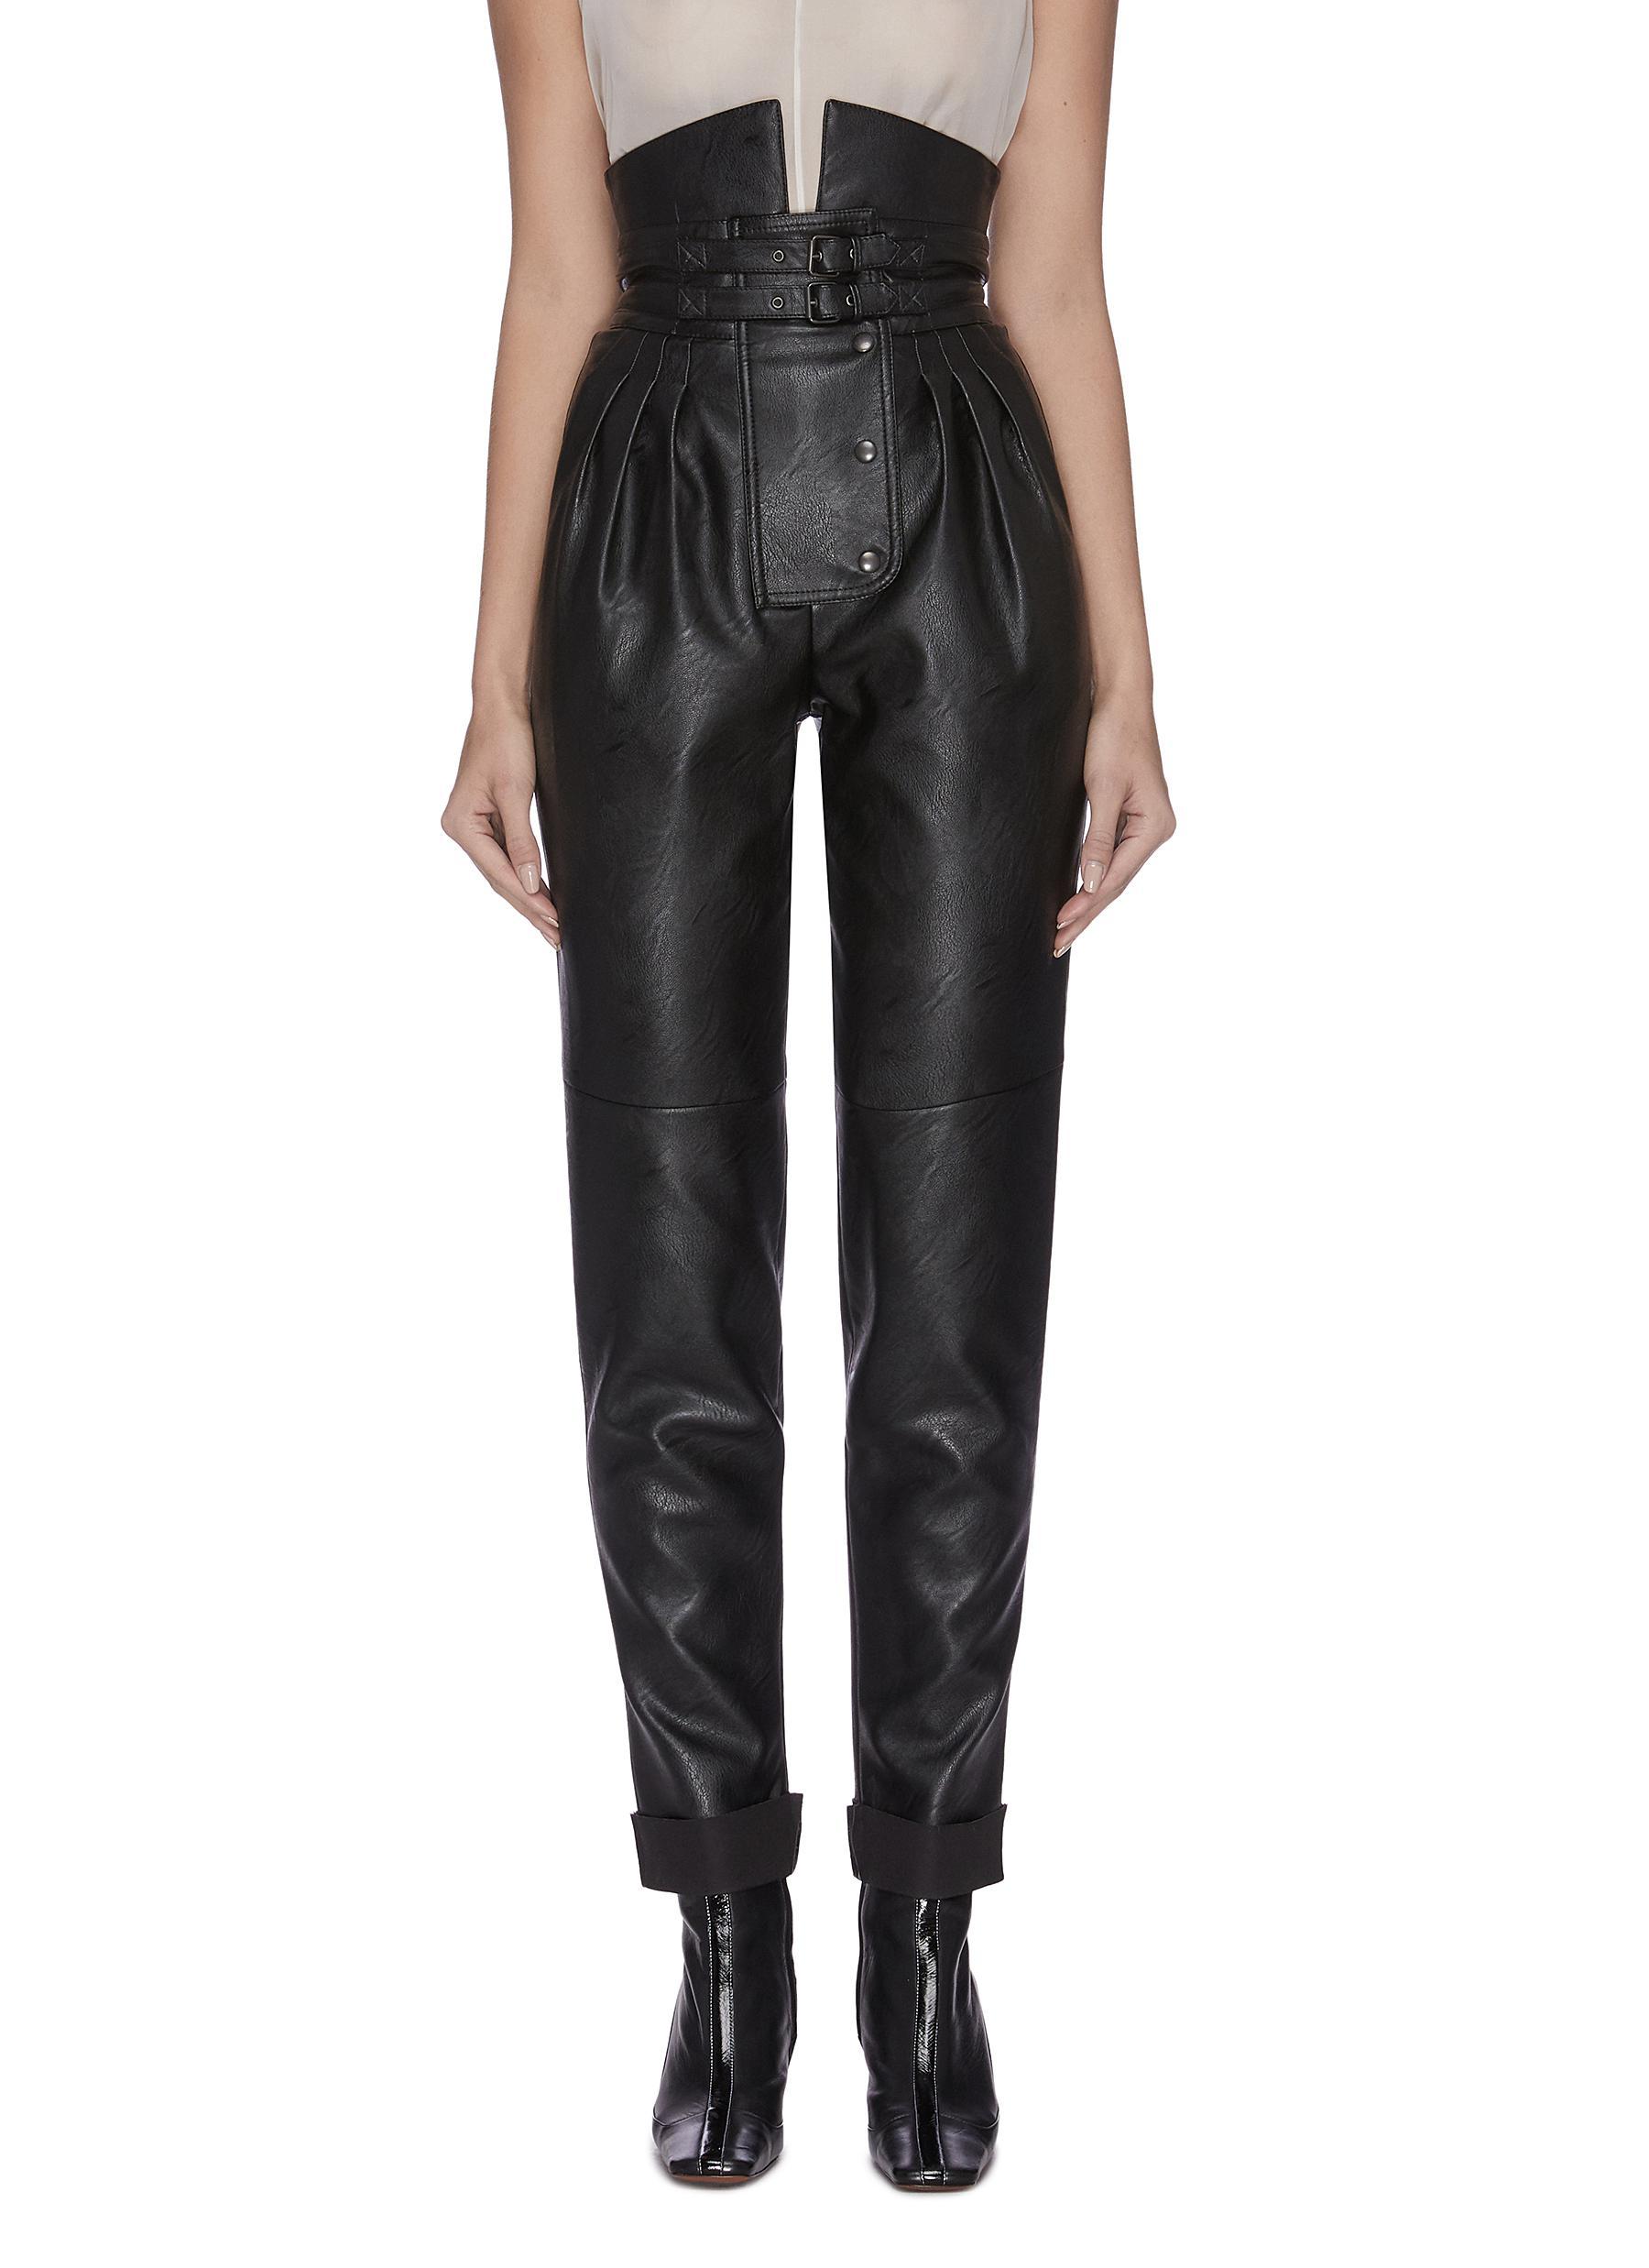 Buckle high waist pleated leather pants by Maison Margiela